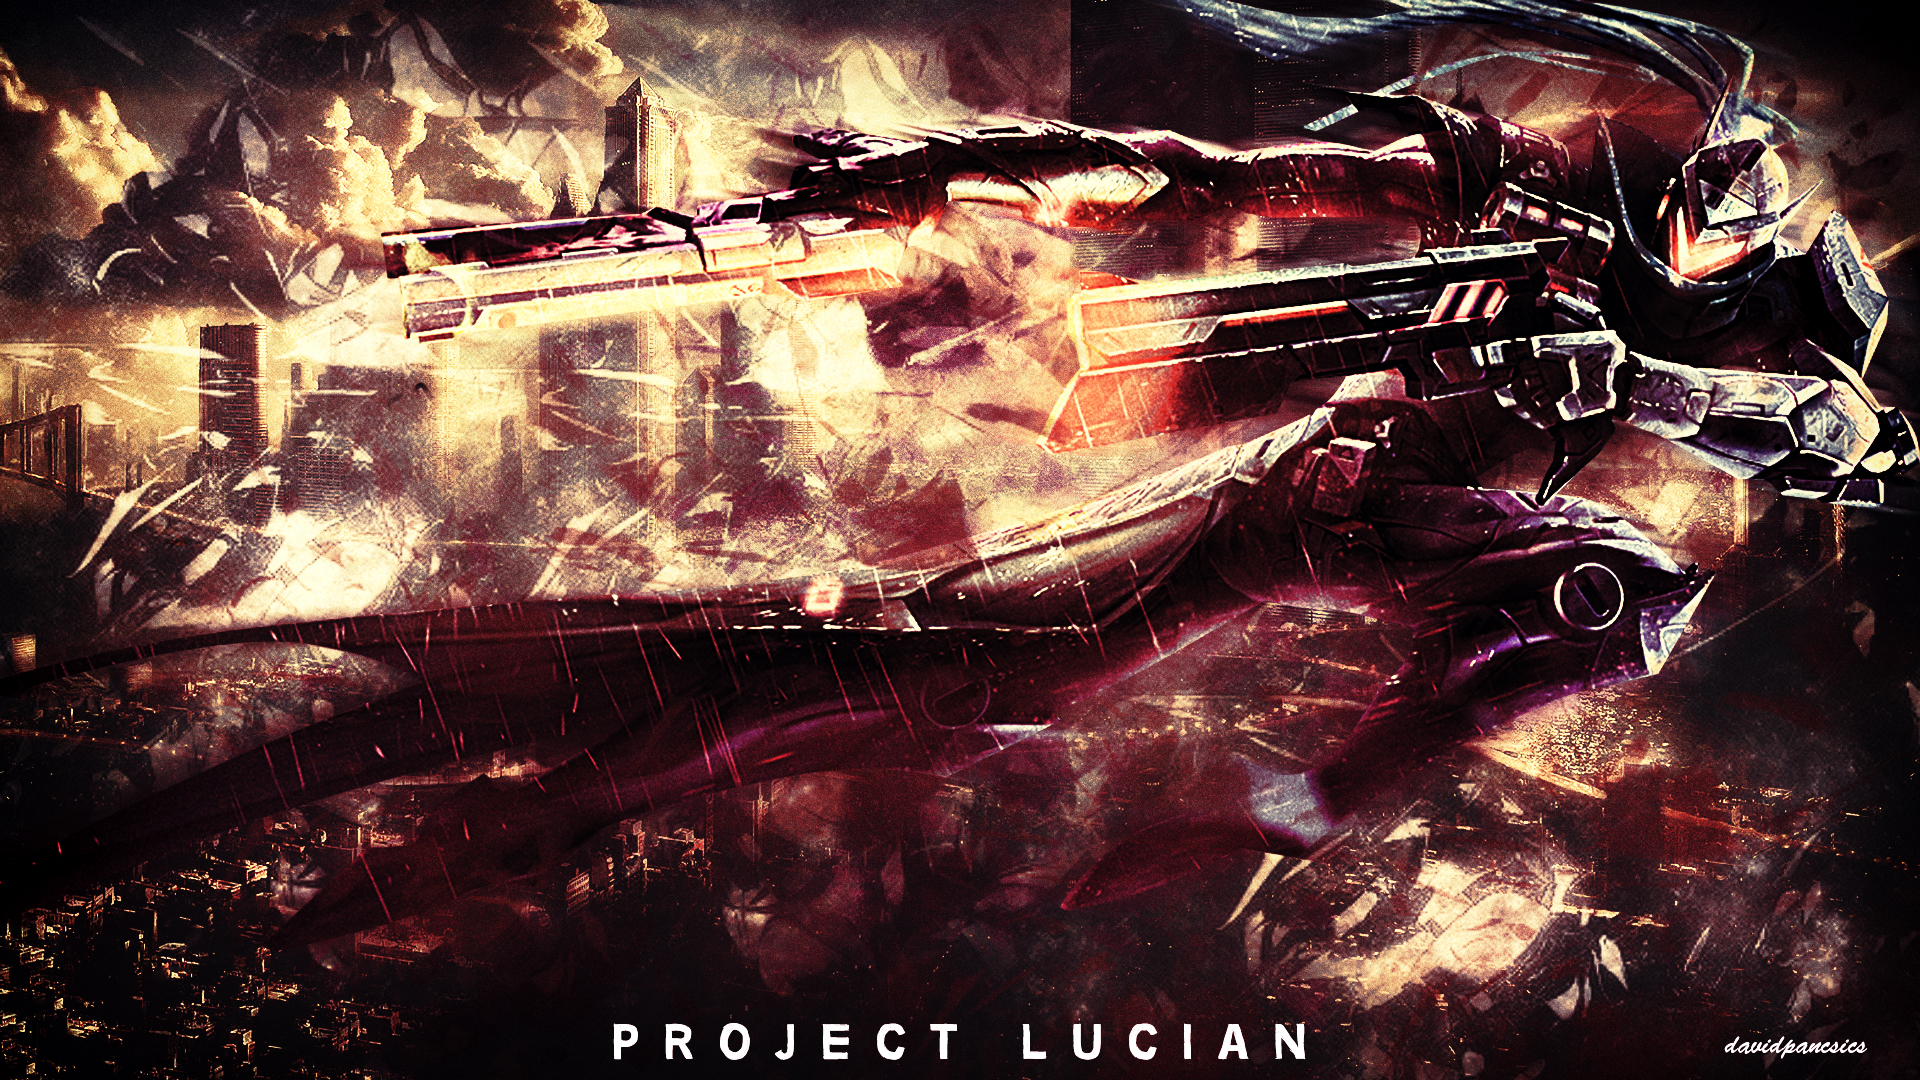 League Of Legends   PROJECT Lucian wallpaper by pancsicsdavid on 1920x1080